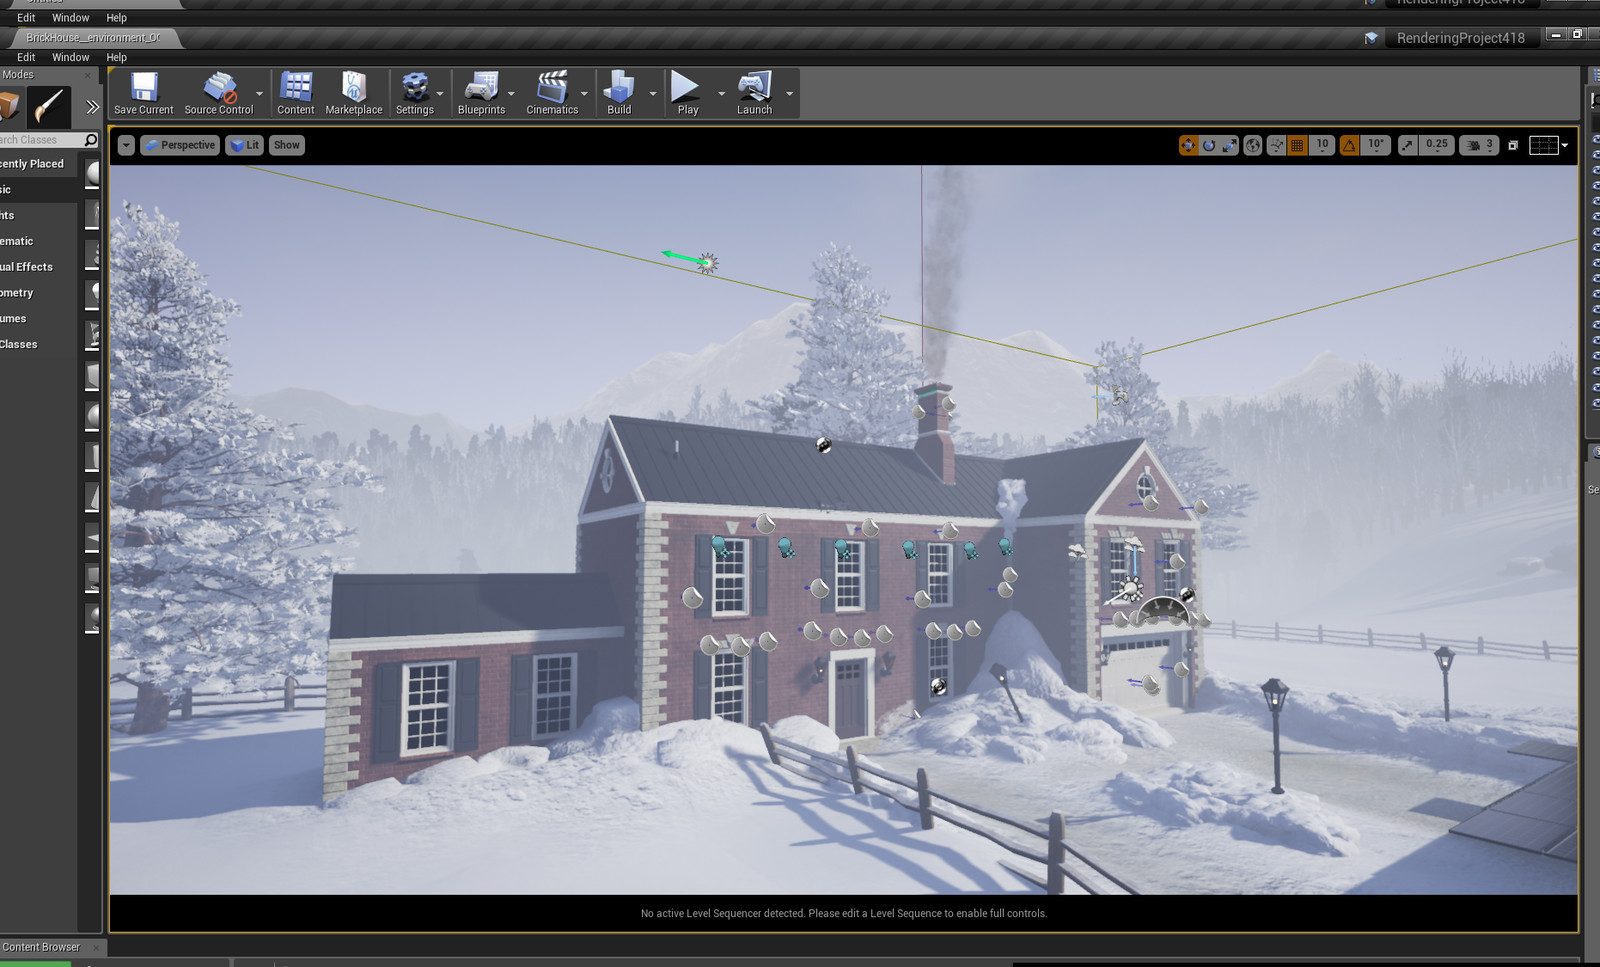 UE4 Screenshot of the scene setup